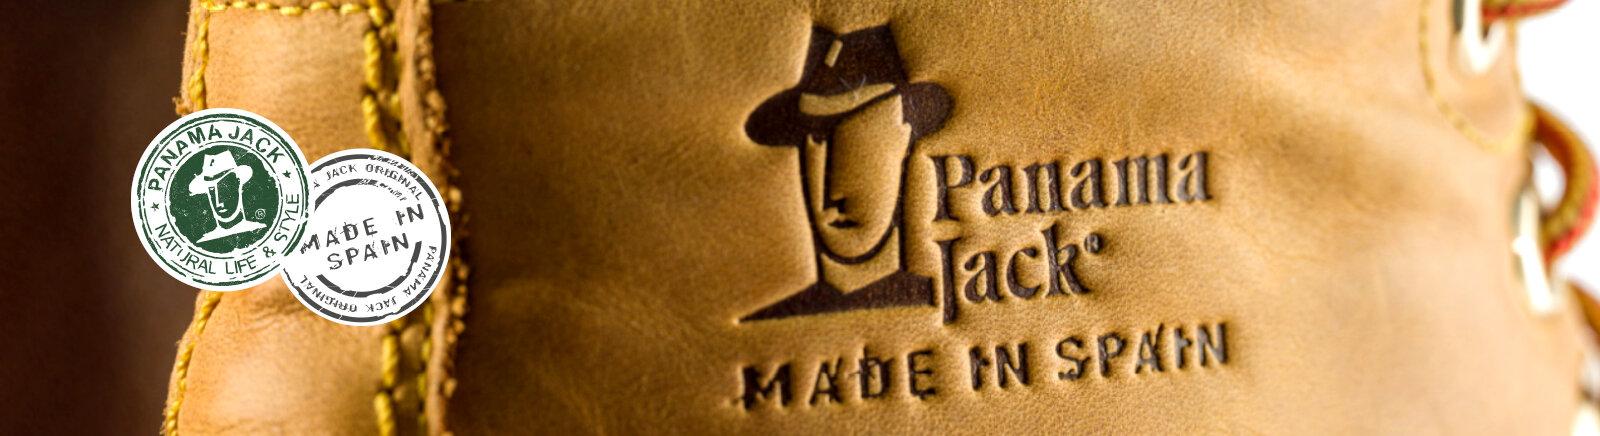 Panama Jack Damenschuhe online bestellen im Prange Schuhe Shop